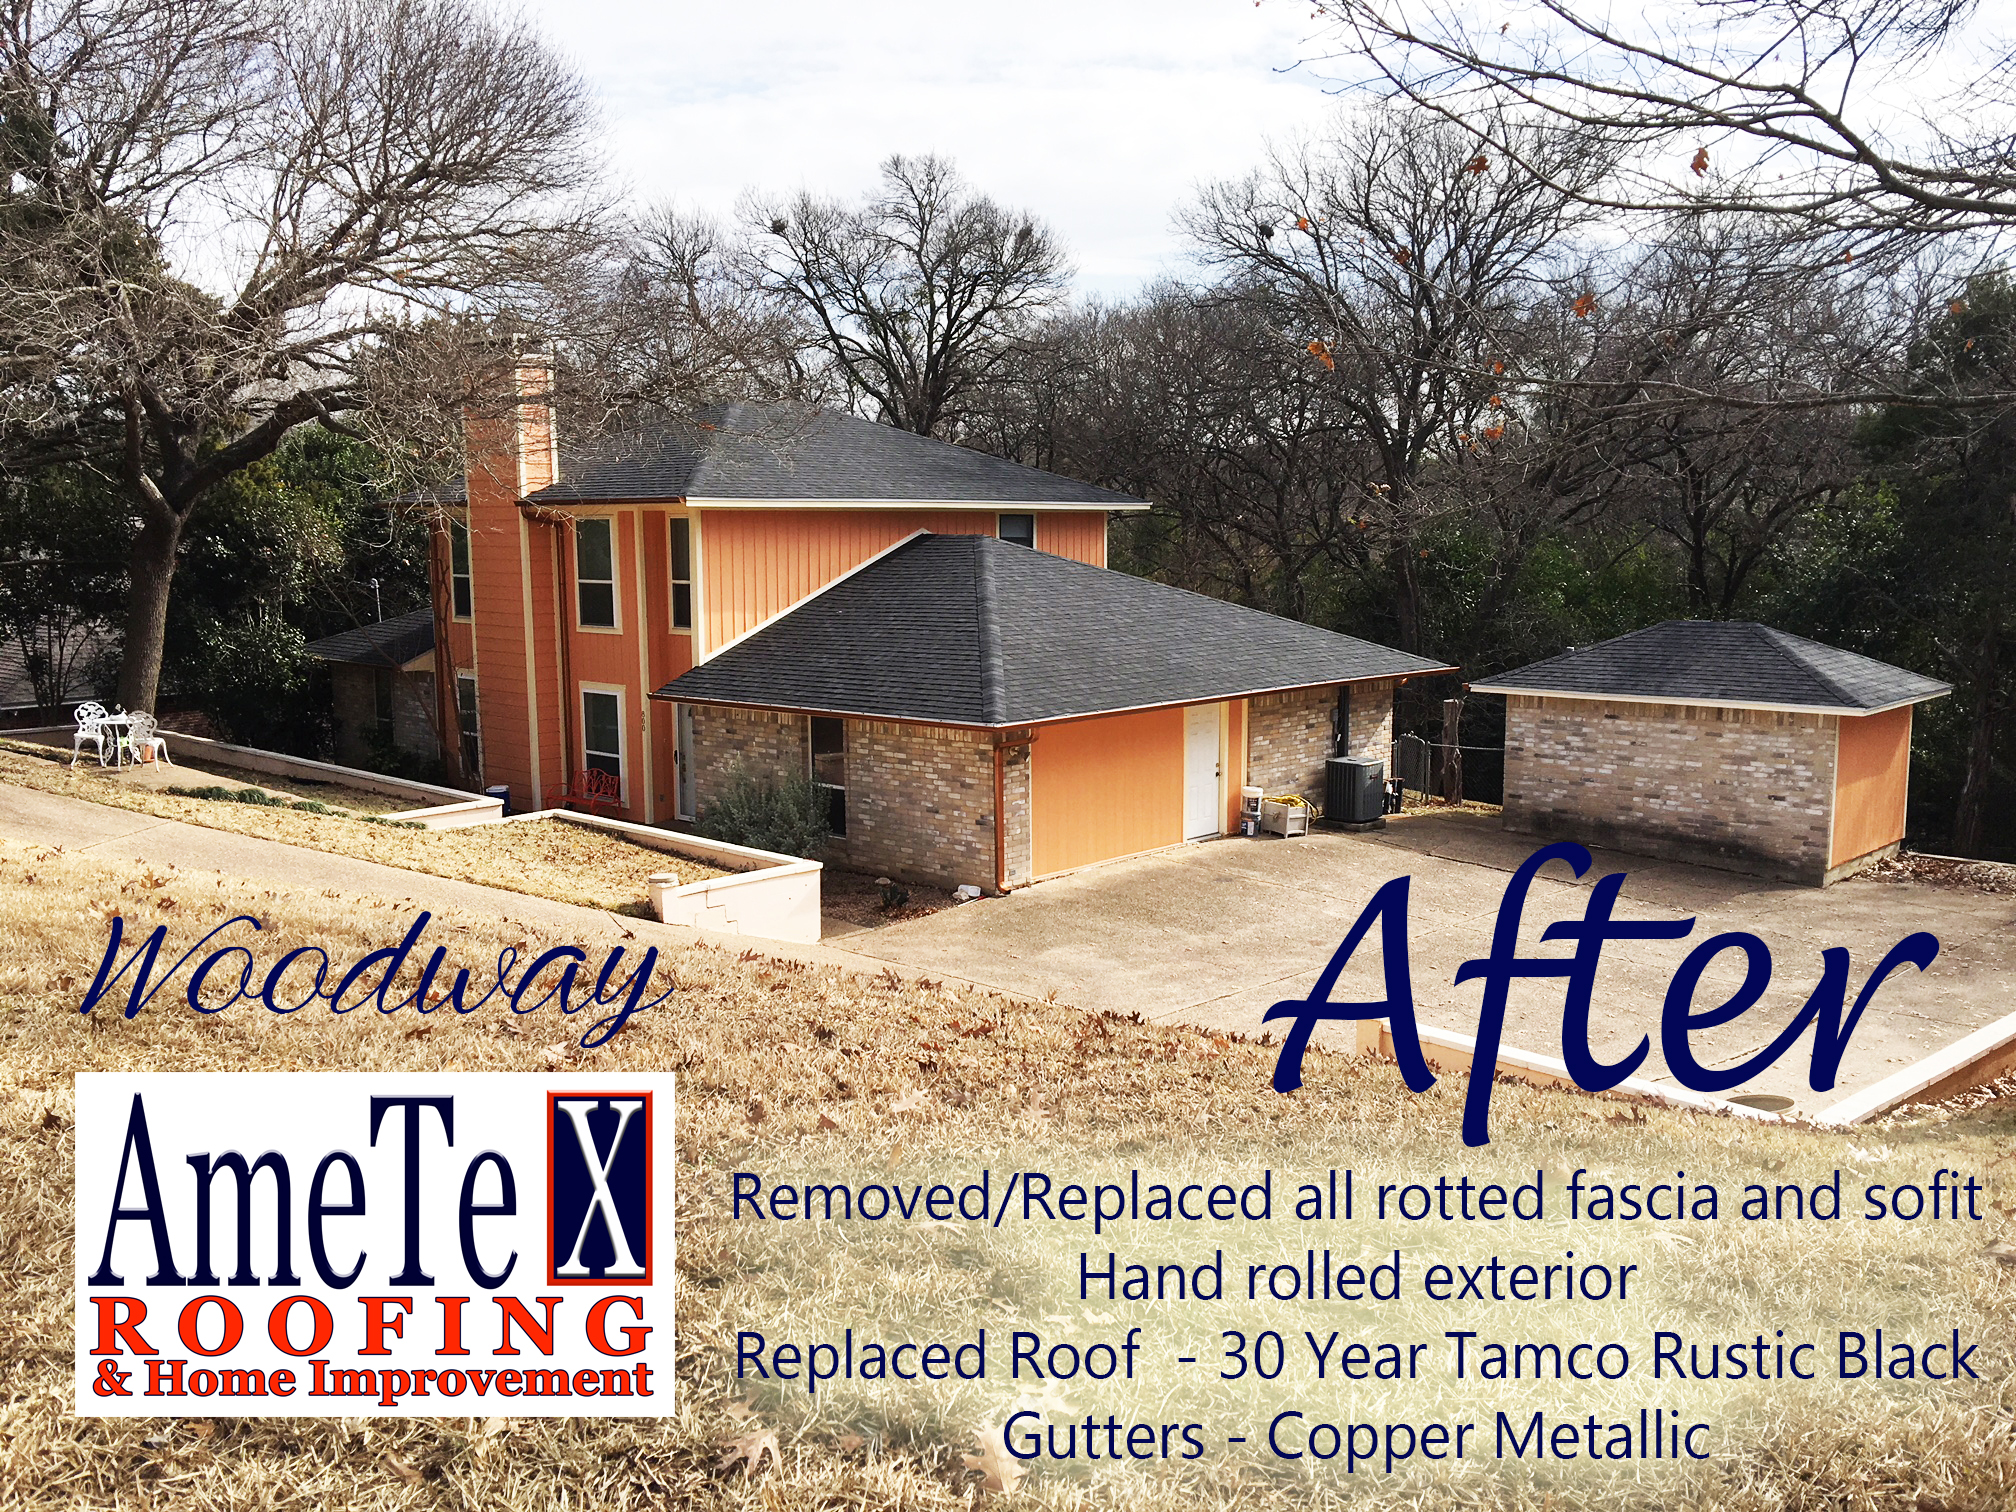 After Deer Ridge ametex roofing waco texas